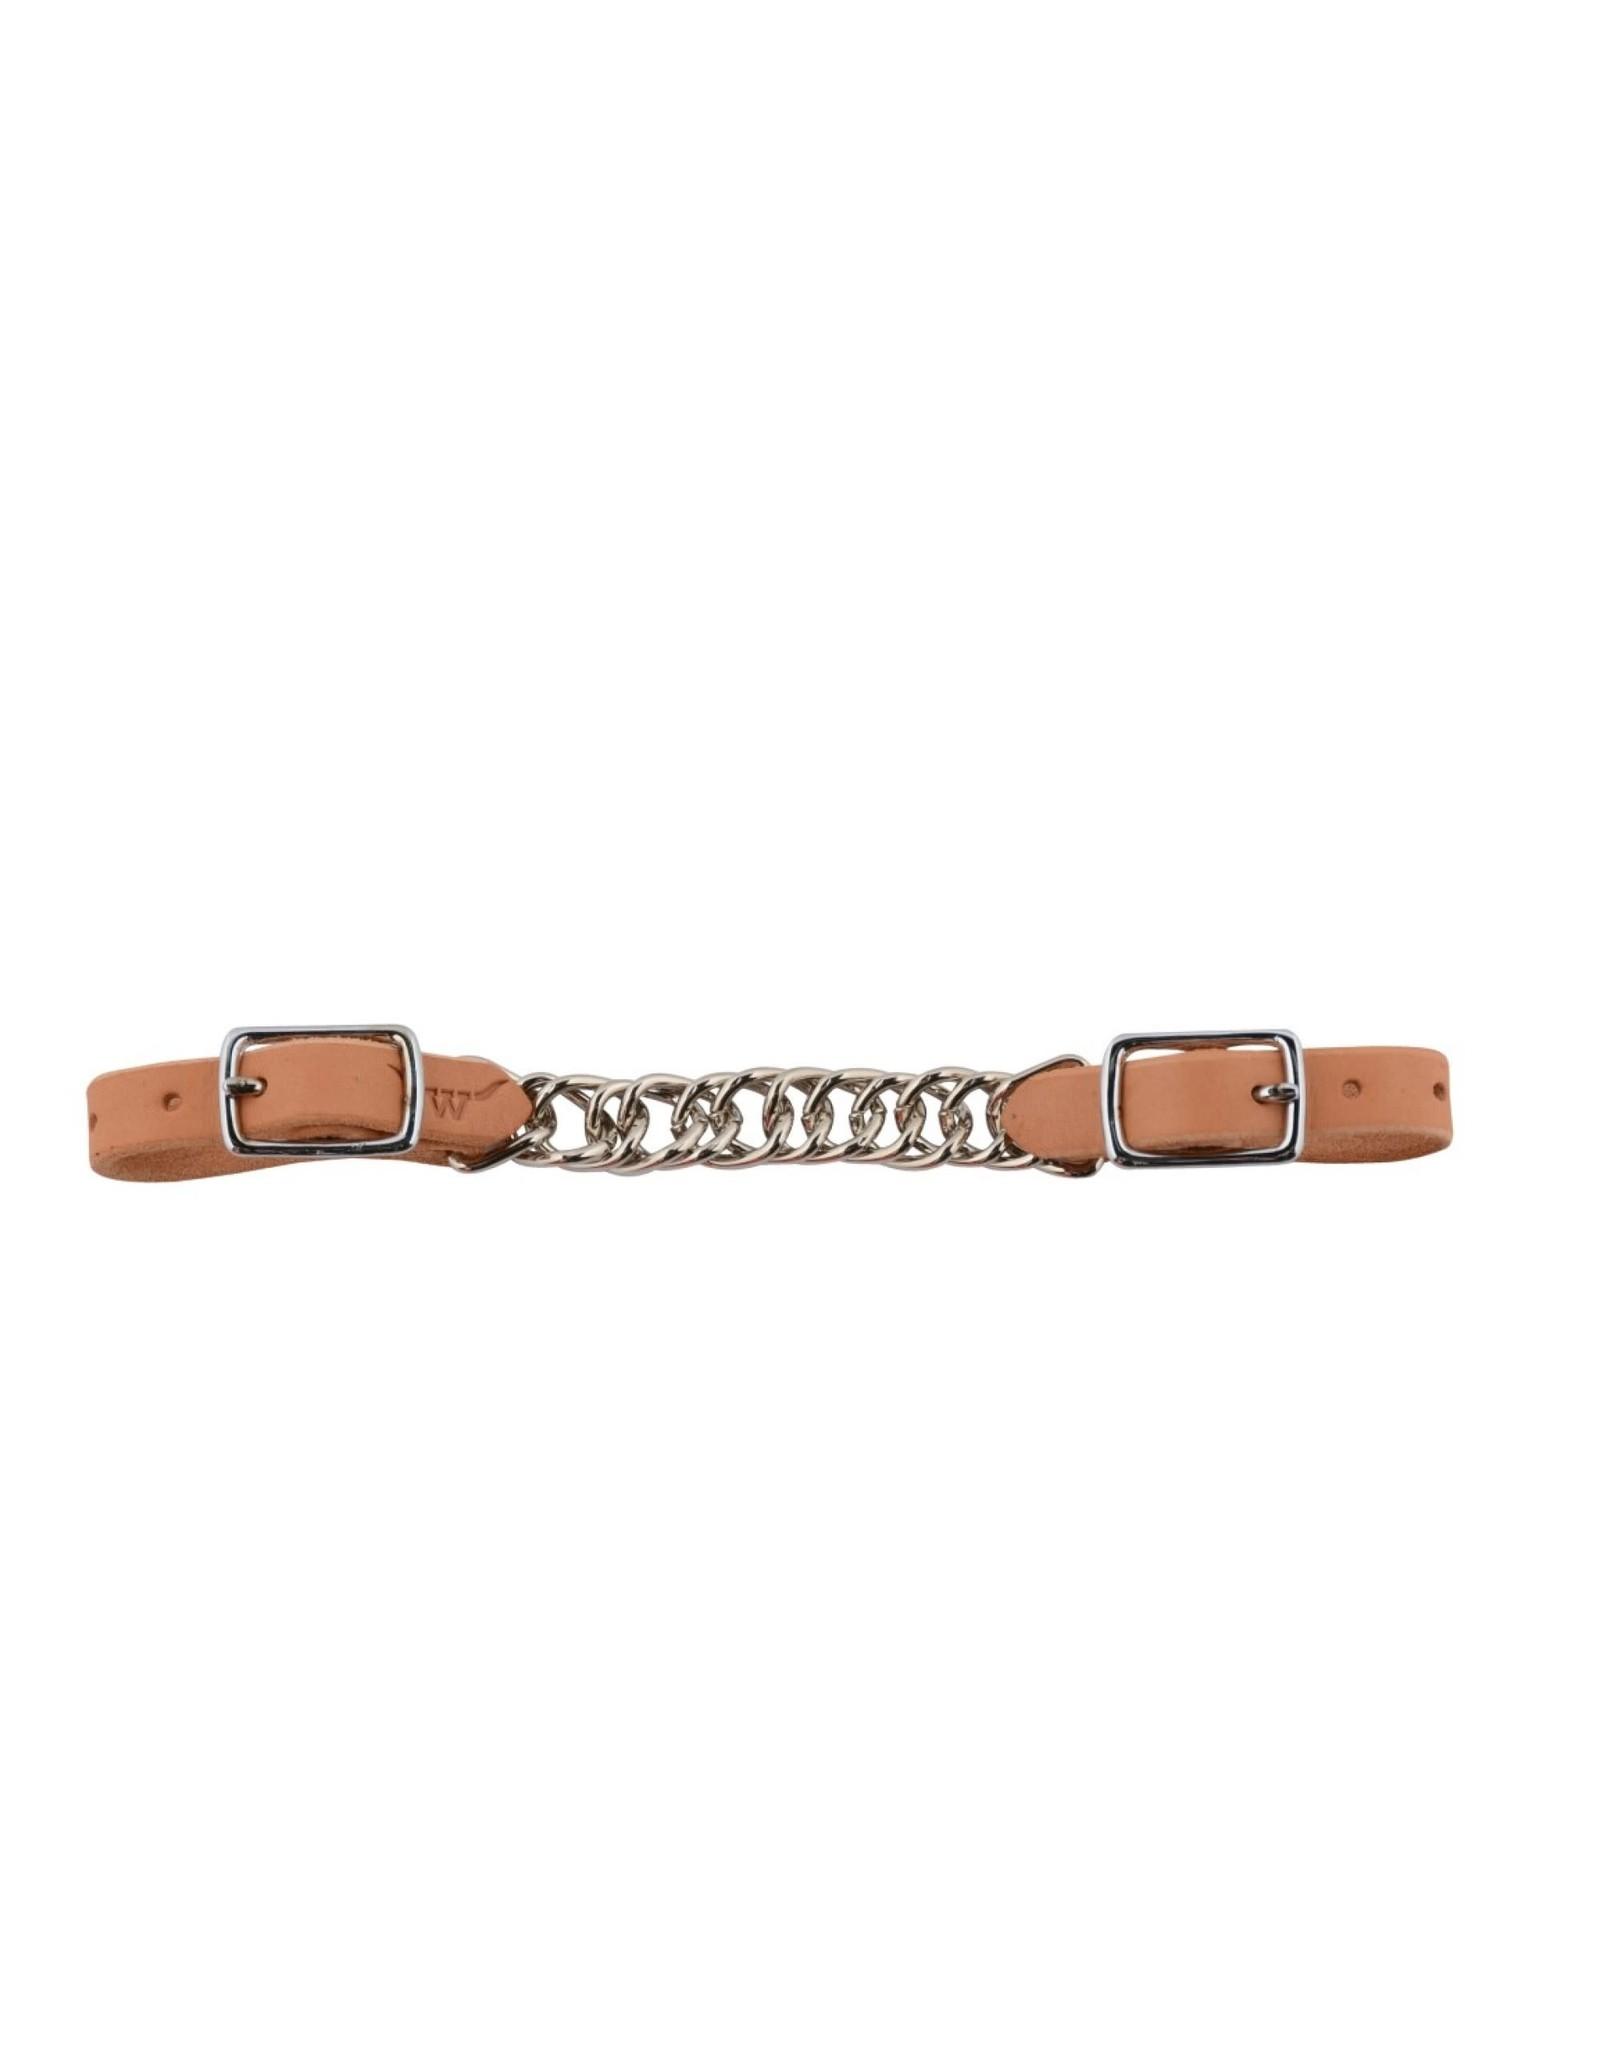 Western Rawhide Single Curb Chain